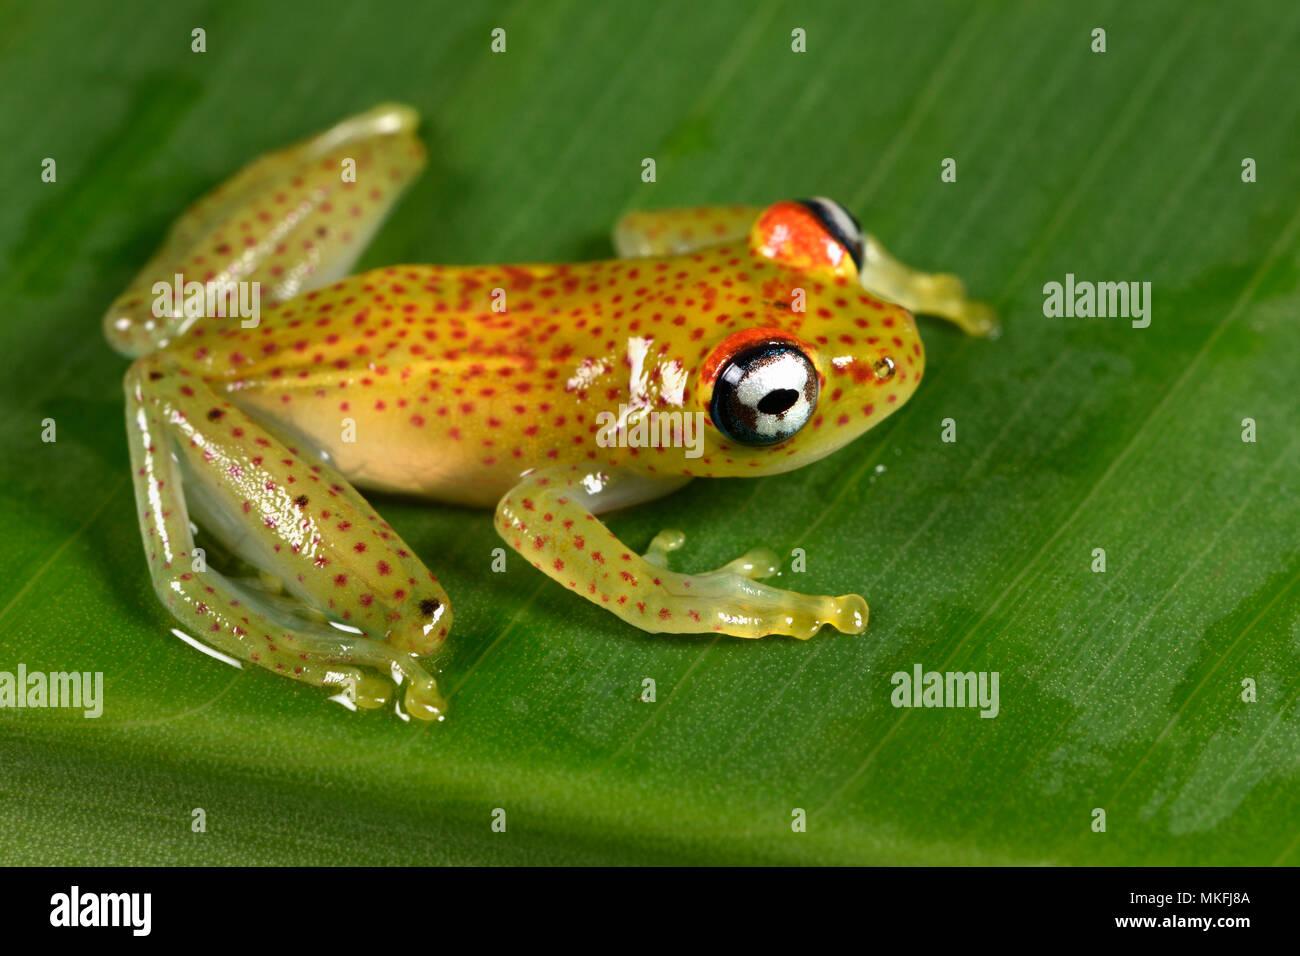 Red-spotted treefrog (Boophis tasymena), Andasibe, Perinet, Alaotra-Mangoro Region, Madagascar Stock Photo